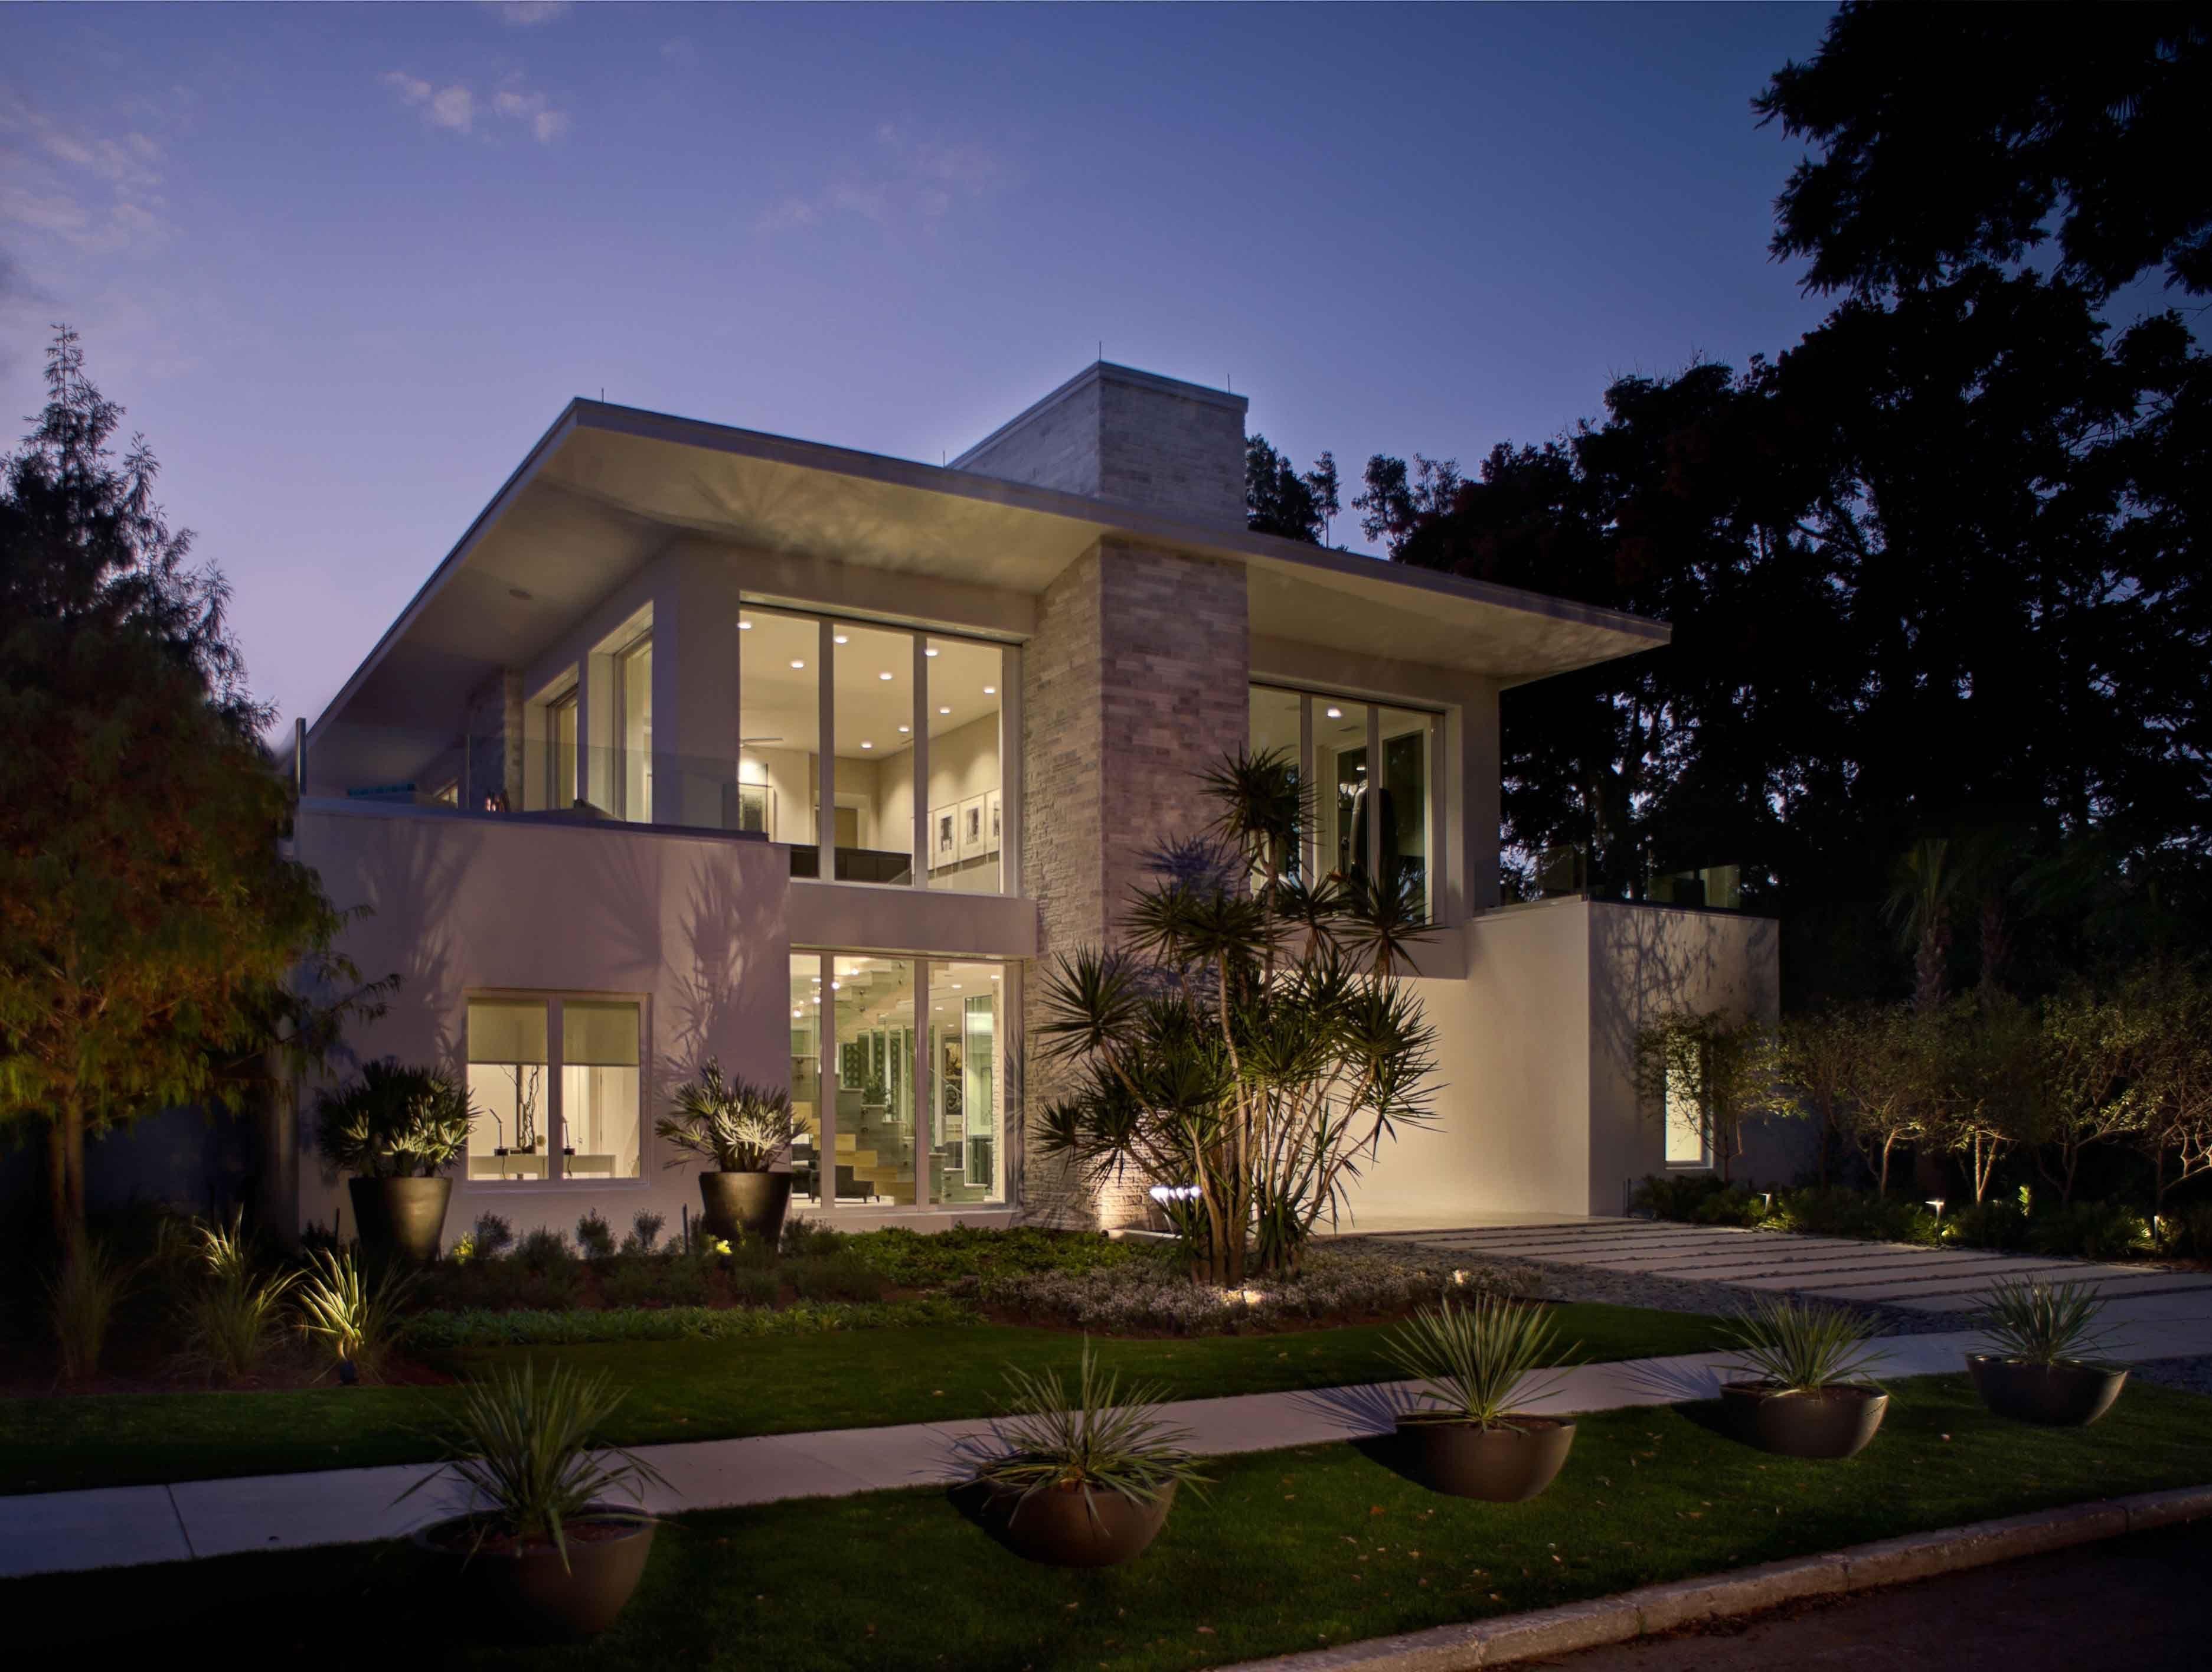 American Modern Architecture